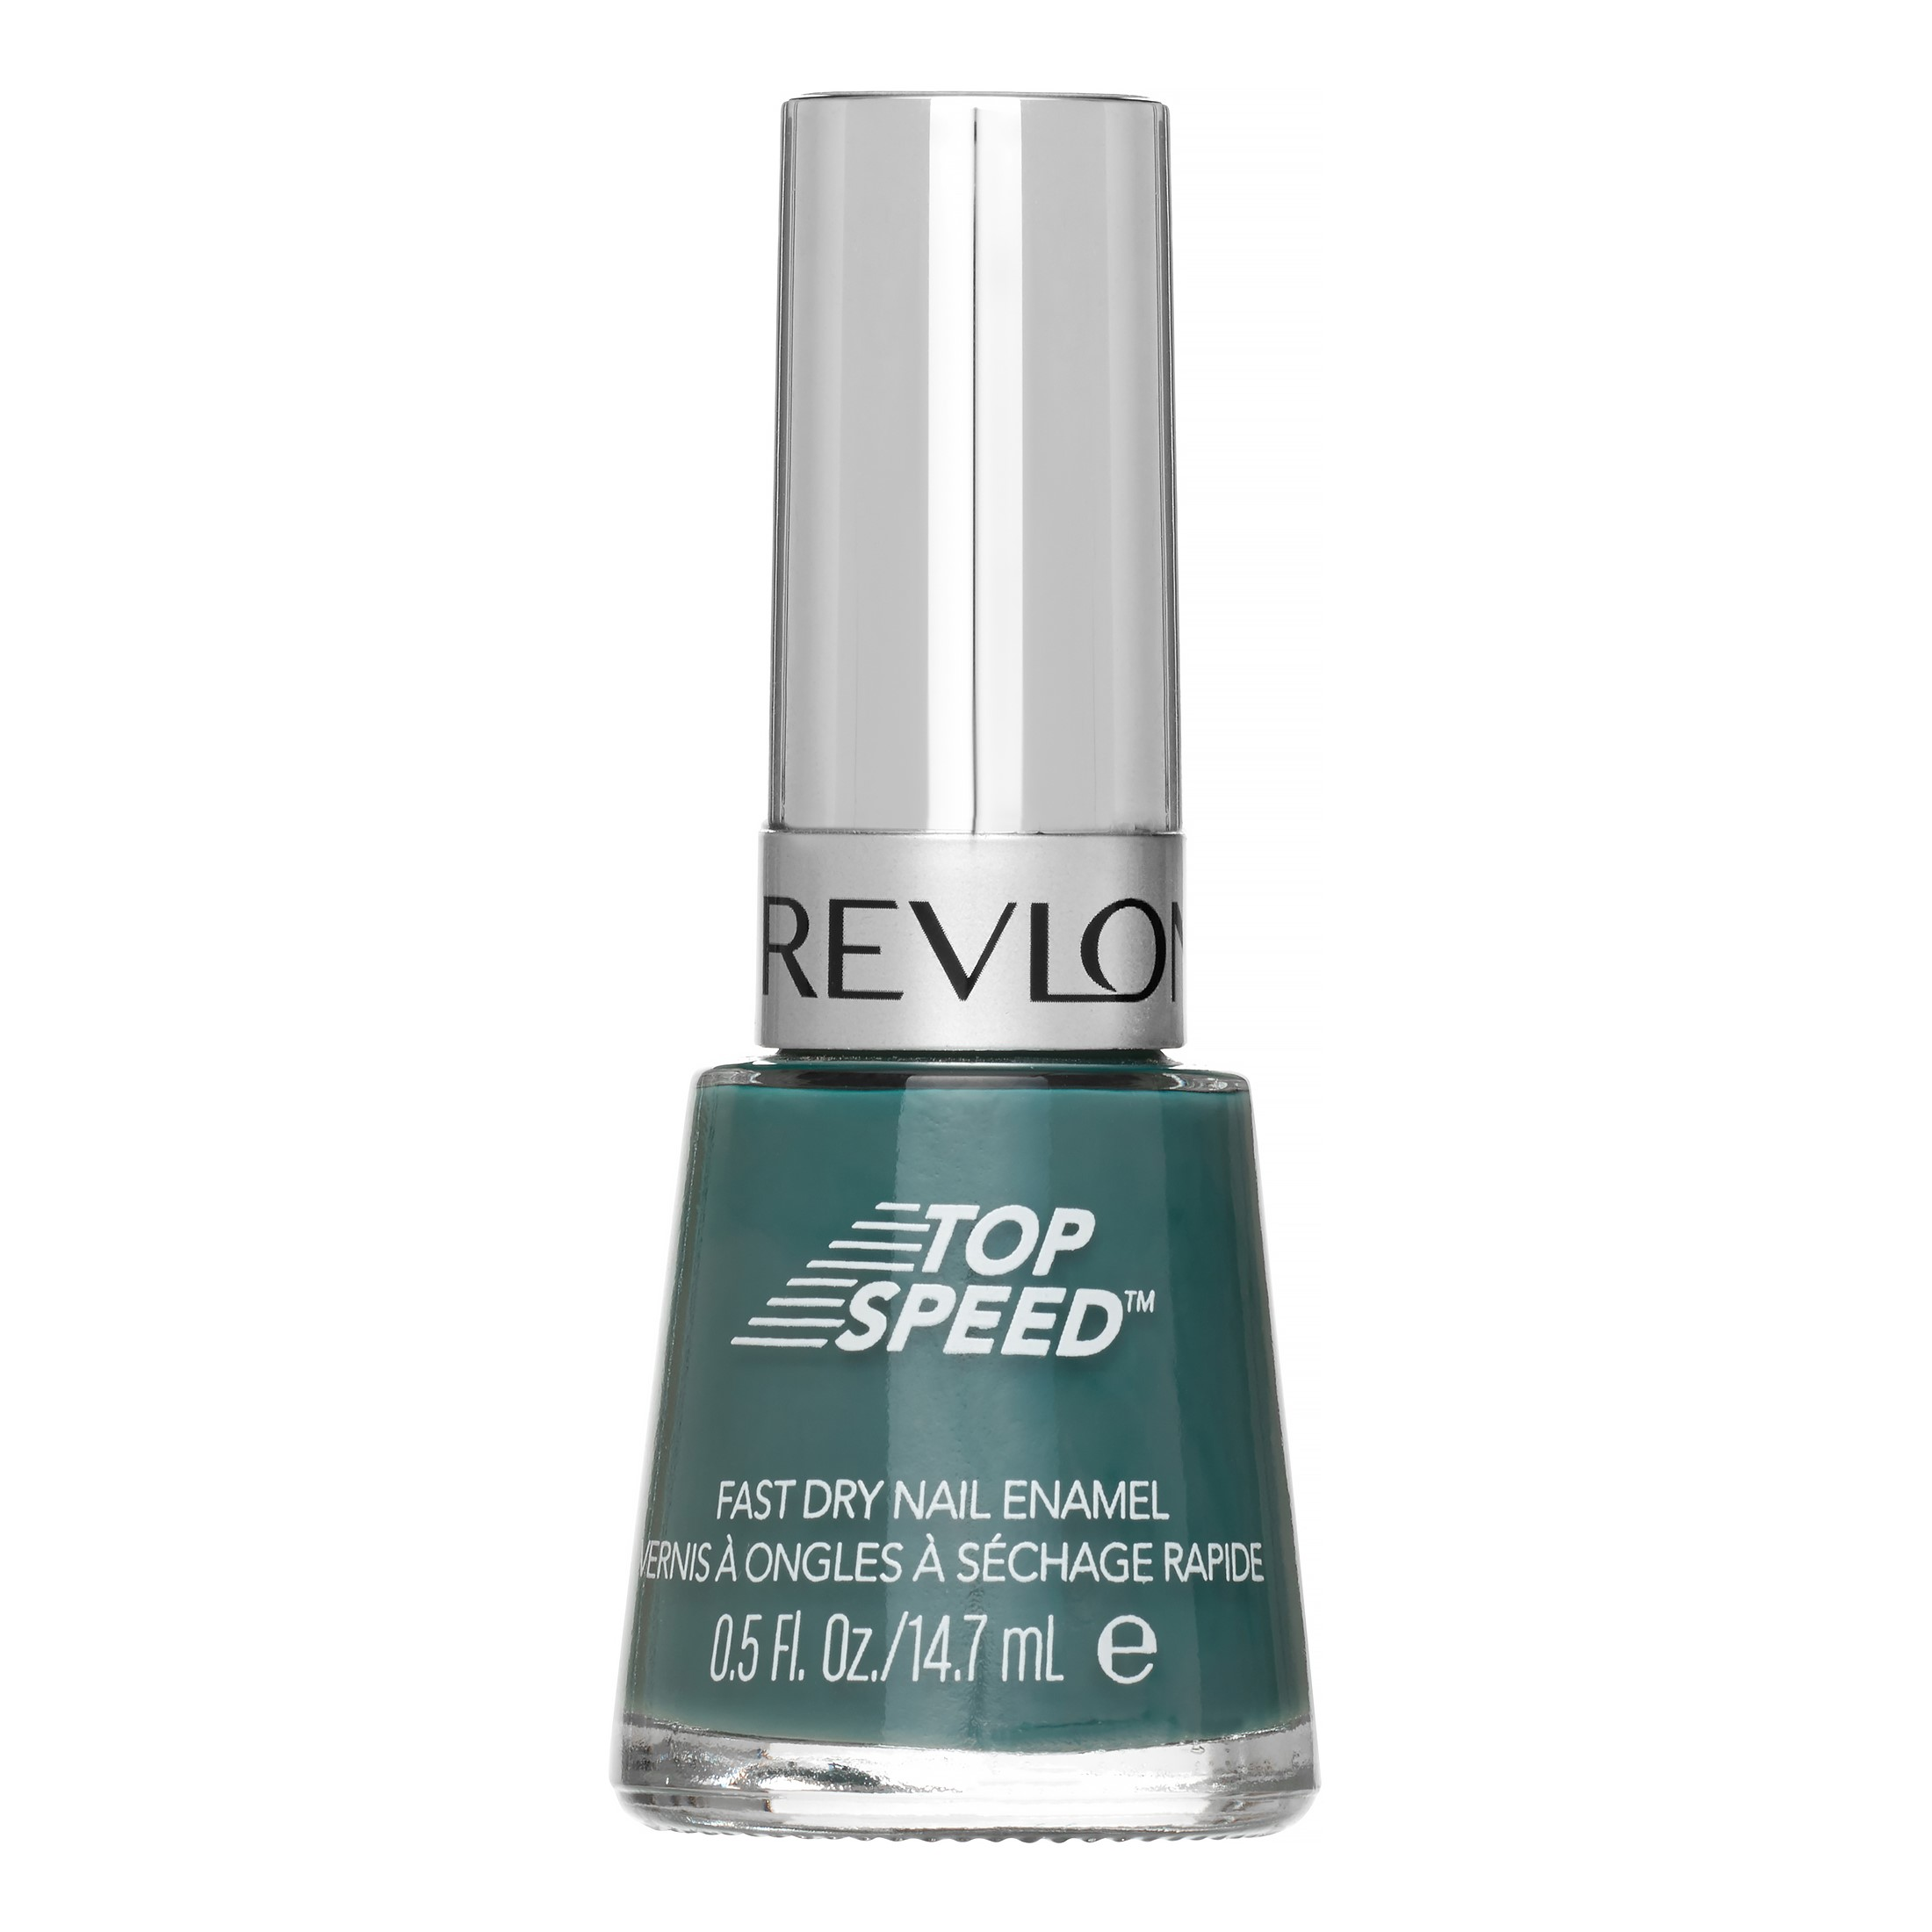 Revlon Top Speed Fast Dry Nail Enamel, 310 Essence, 0.5 fl oz